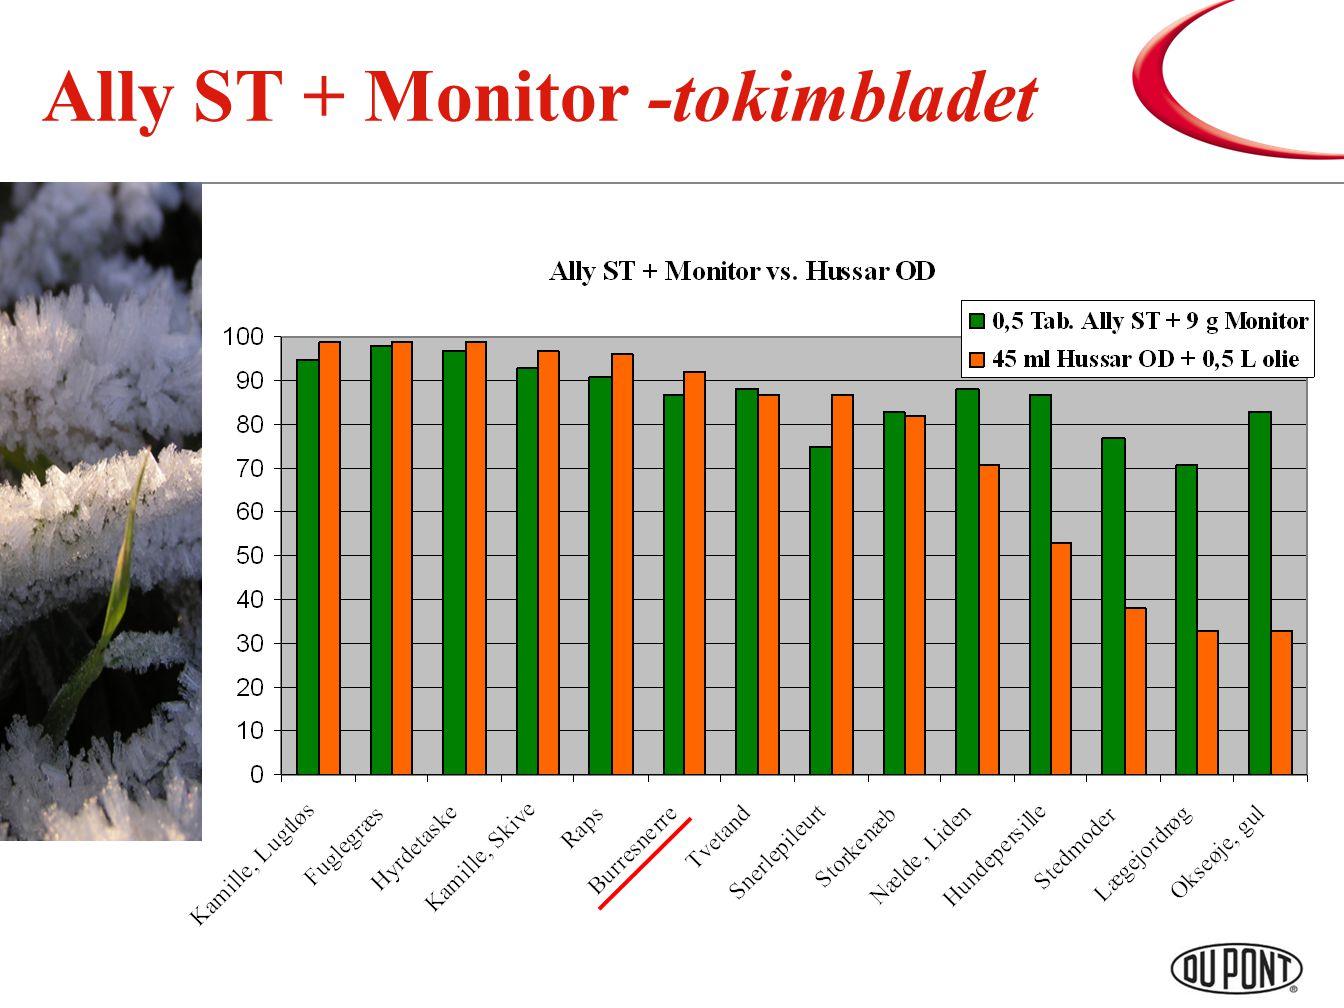 Ally ST + Monitor -tokimbladet